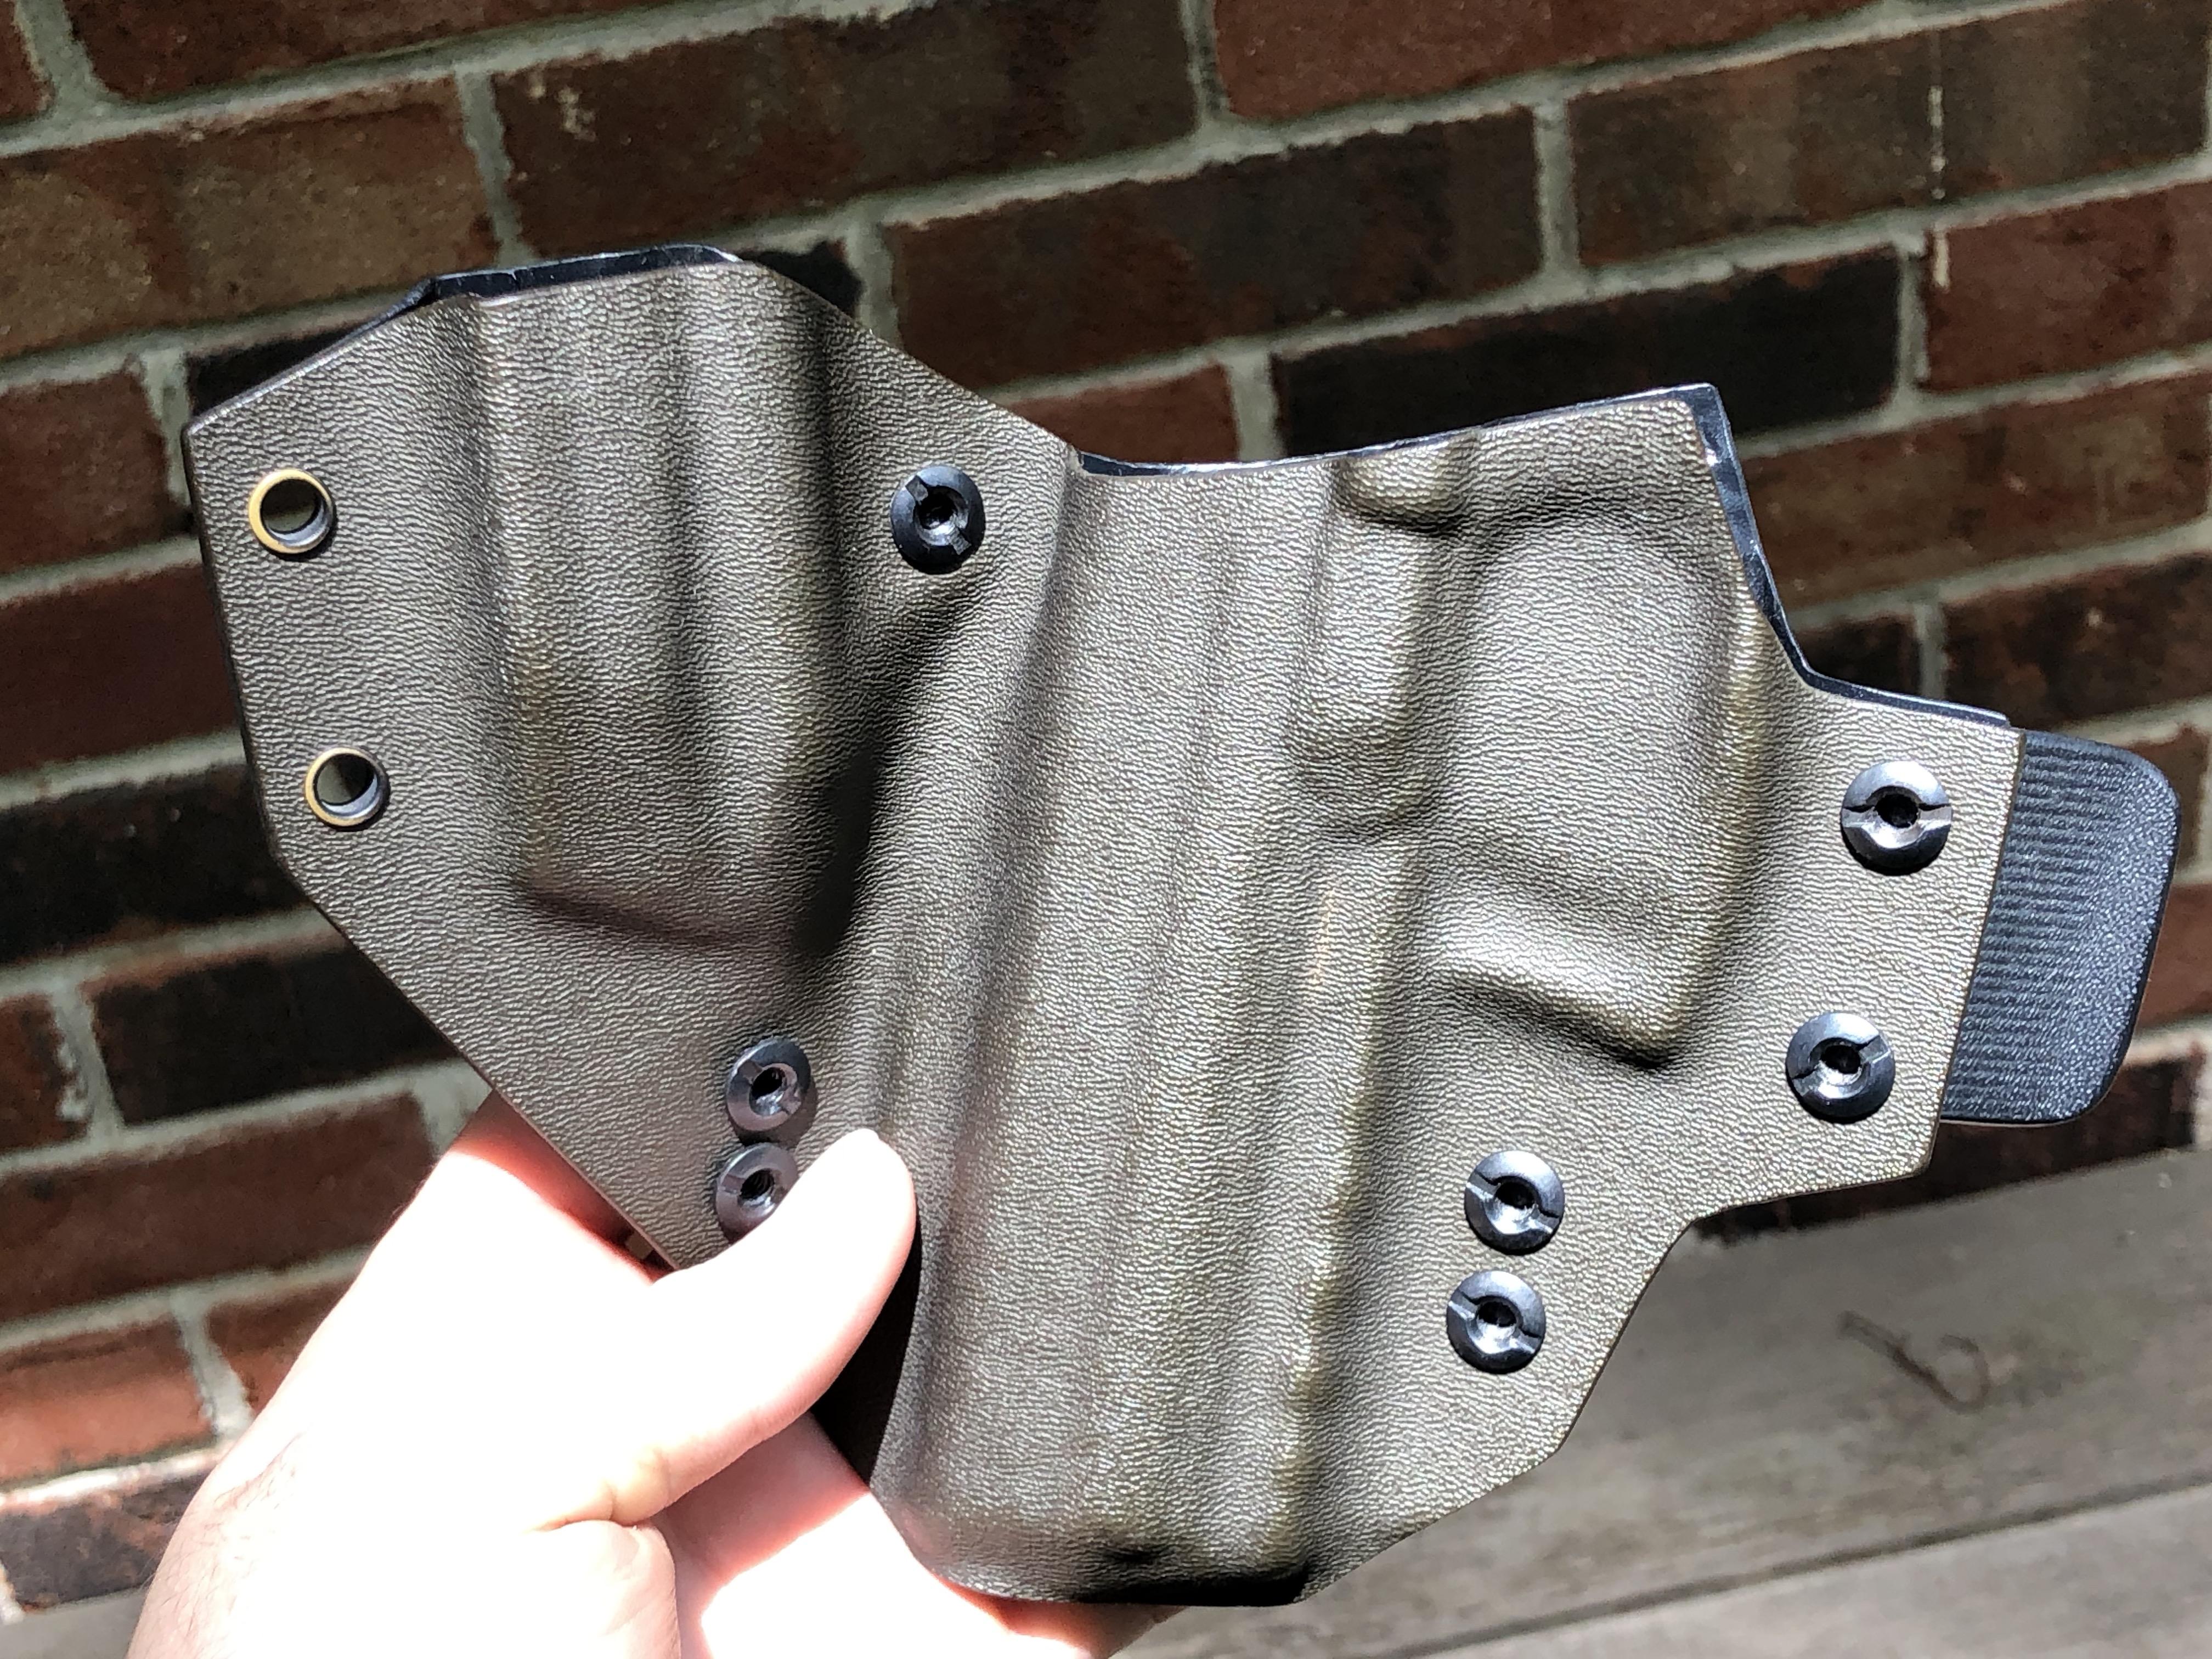 WTS - Like new T-Rex Arms Sidecar P30L appendix holster-tilh0wbbsycqt7x4kq2i-g.jpg